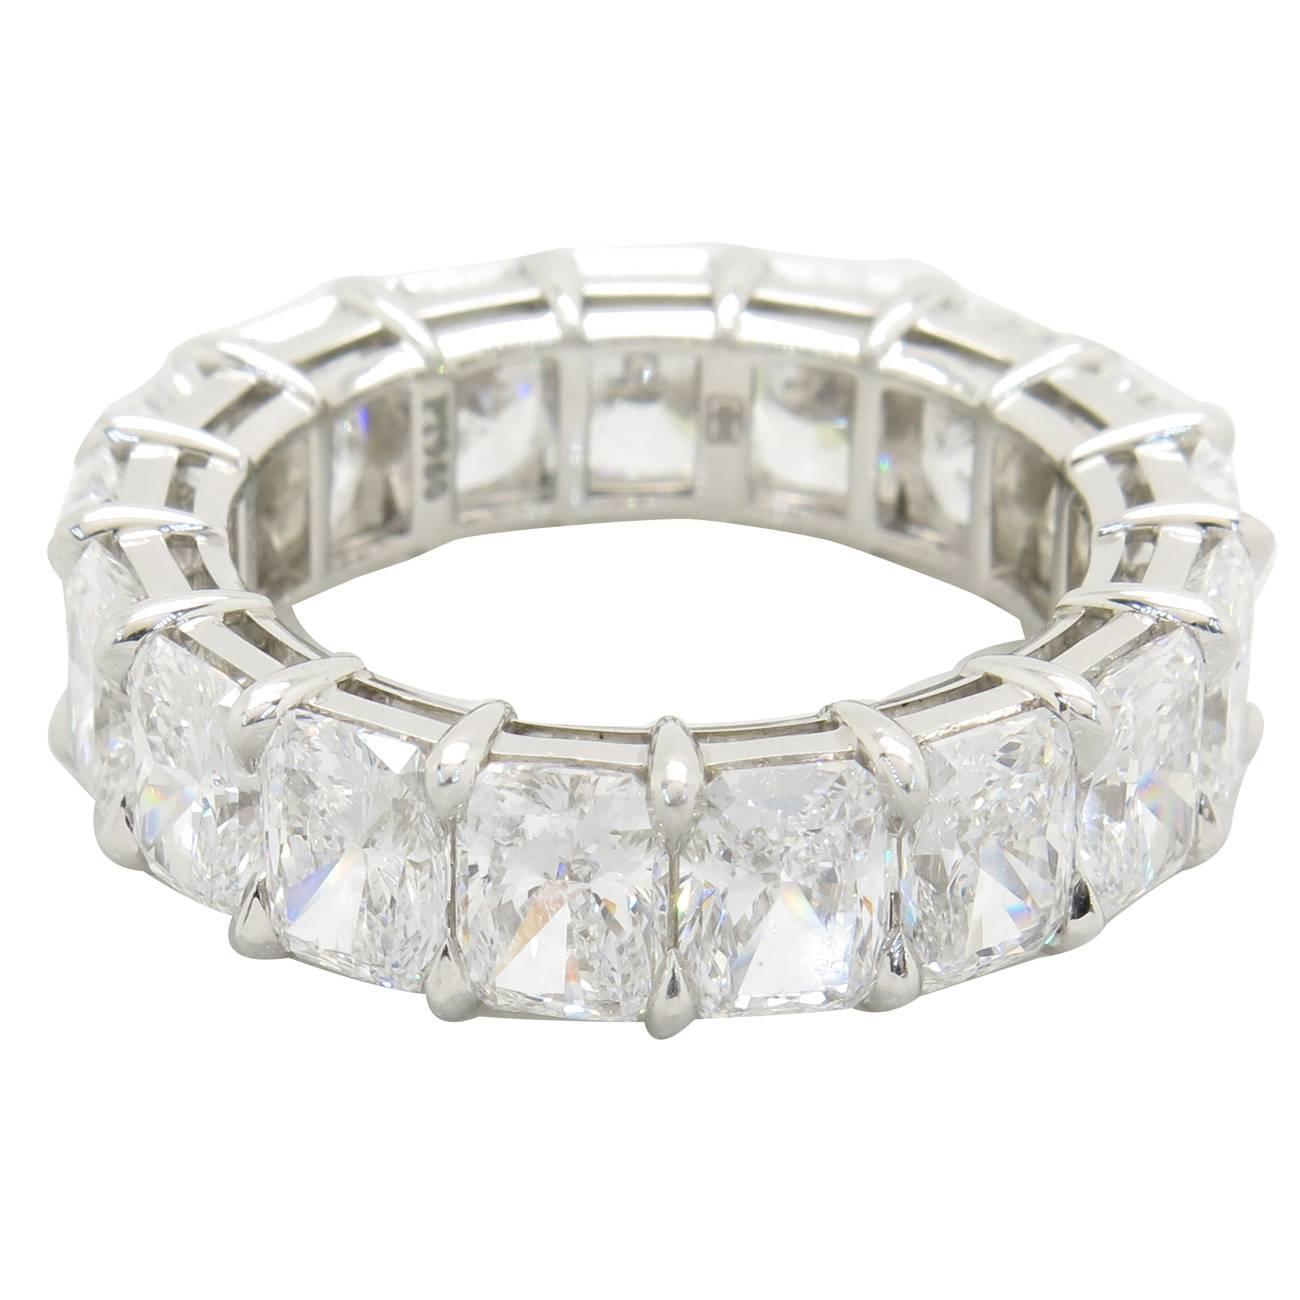 Harry Winston Radiant Diamond Platinum Eternity Band For Sale At 1stdibs